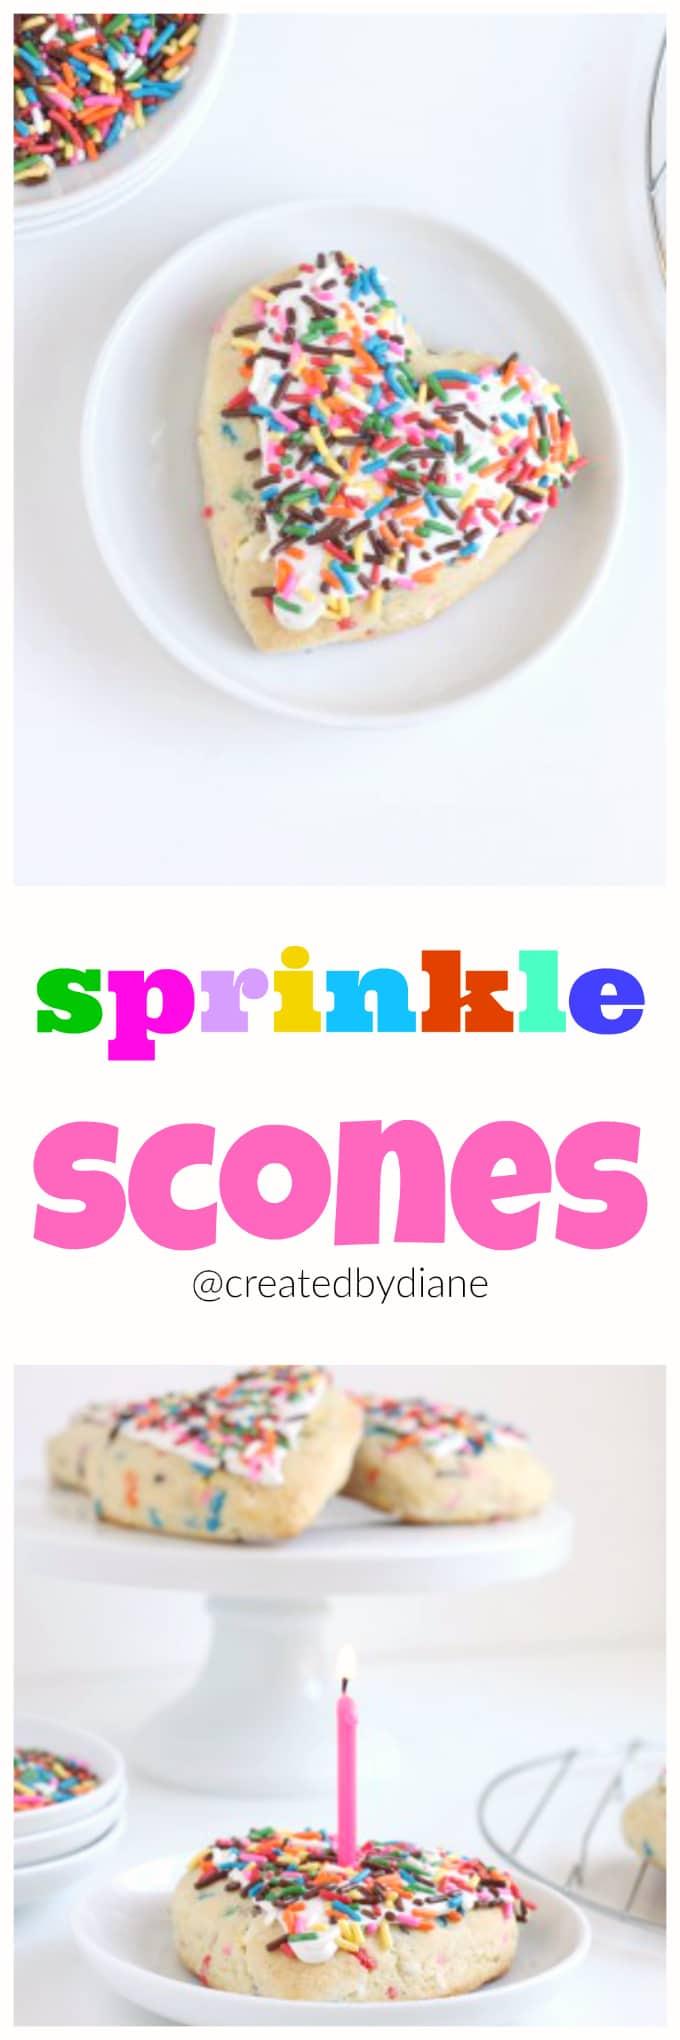 sprinkle scones @createdbydiane